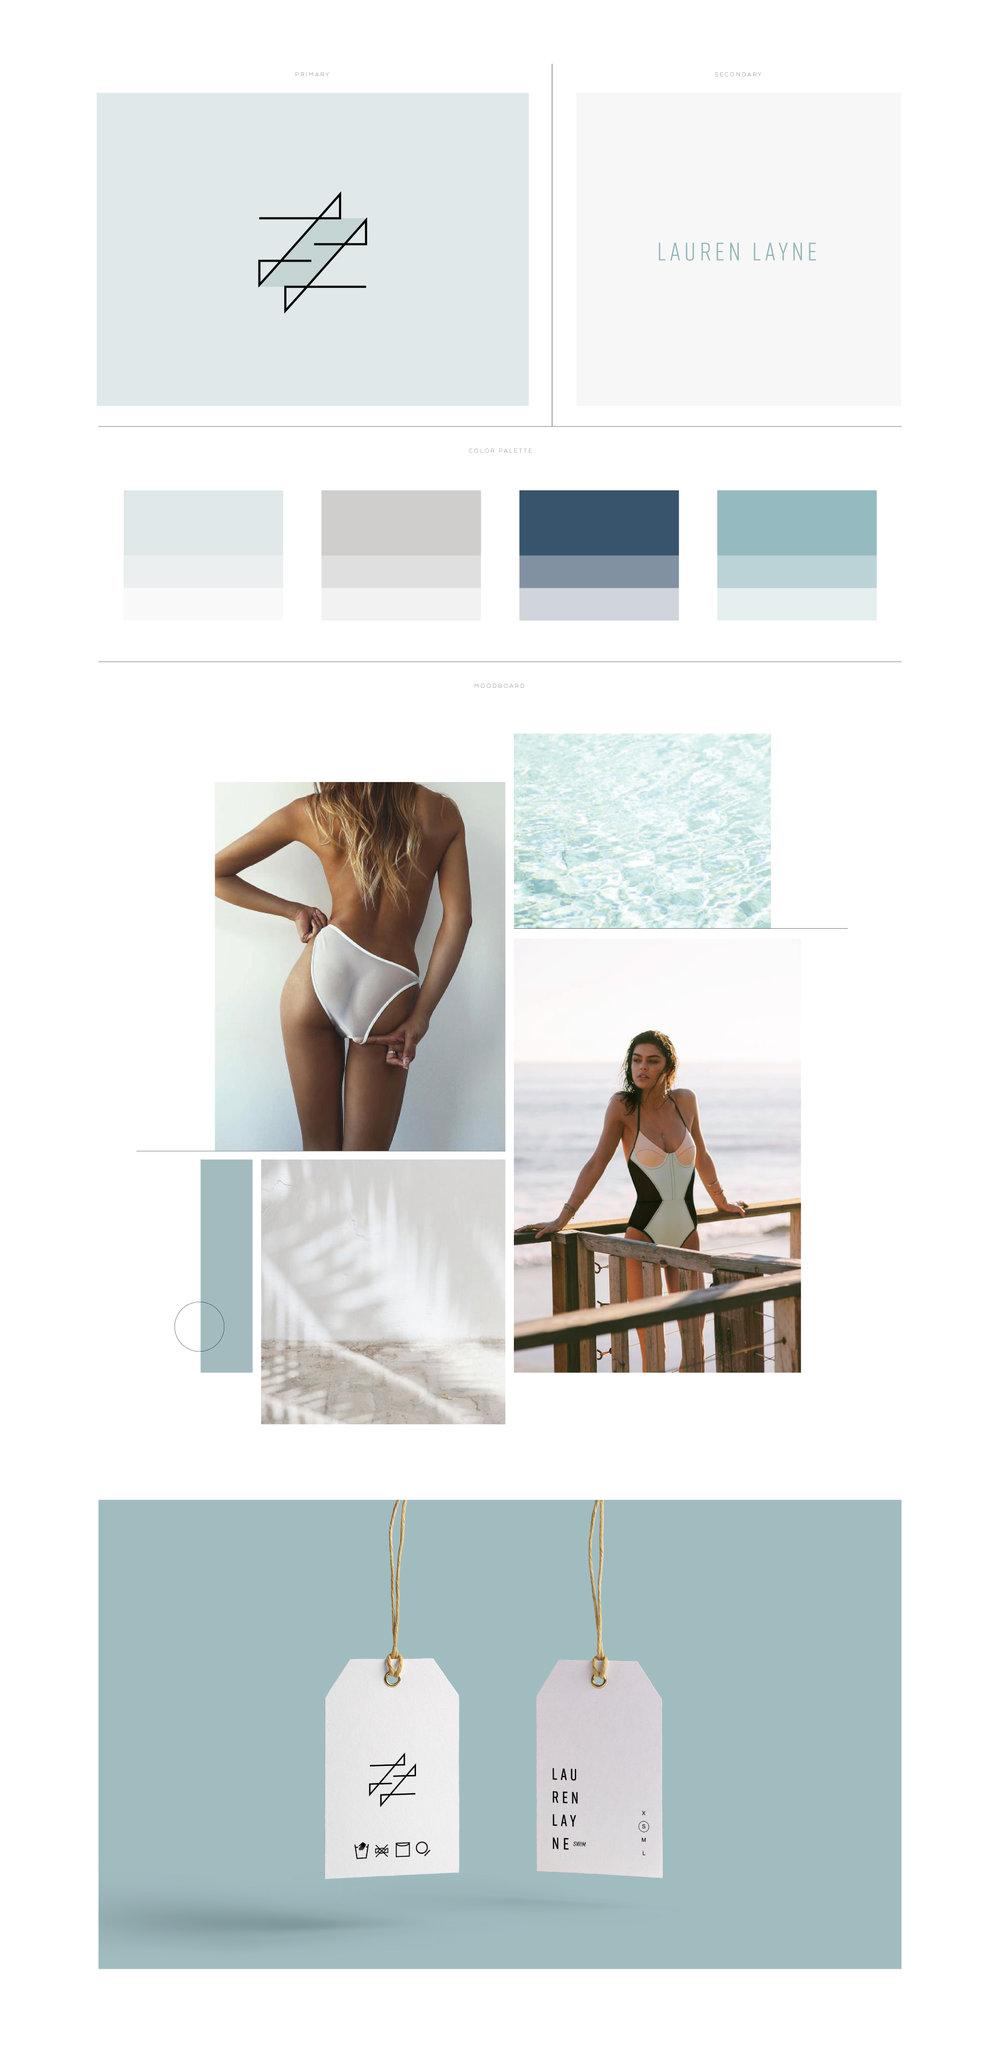 Lauren-Layne_Brand-Board_2.jpg